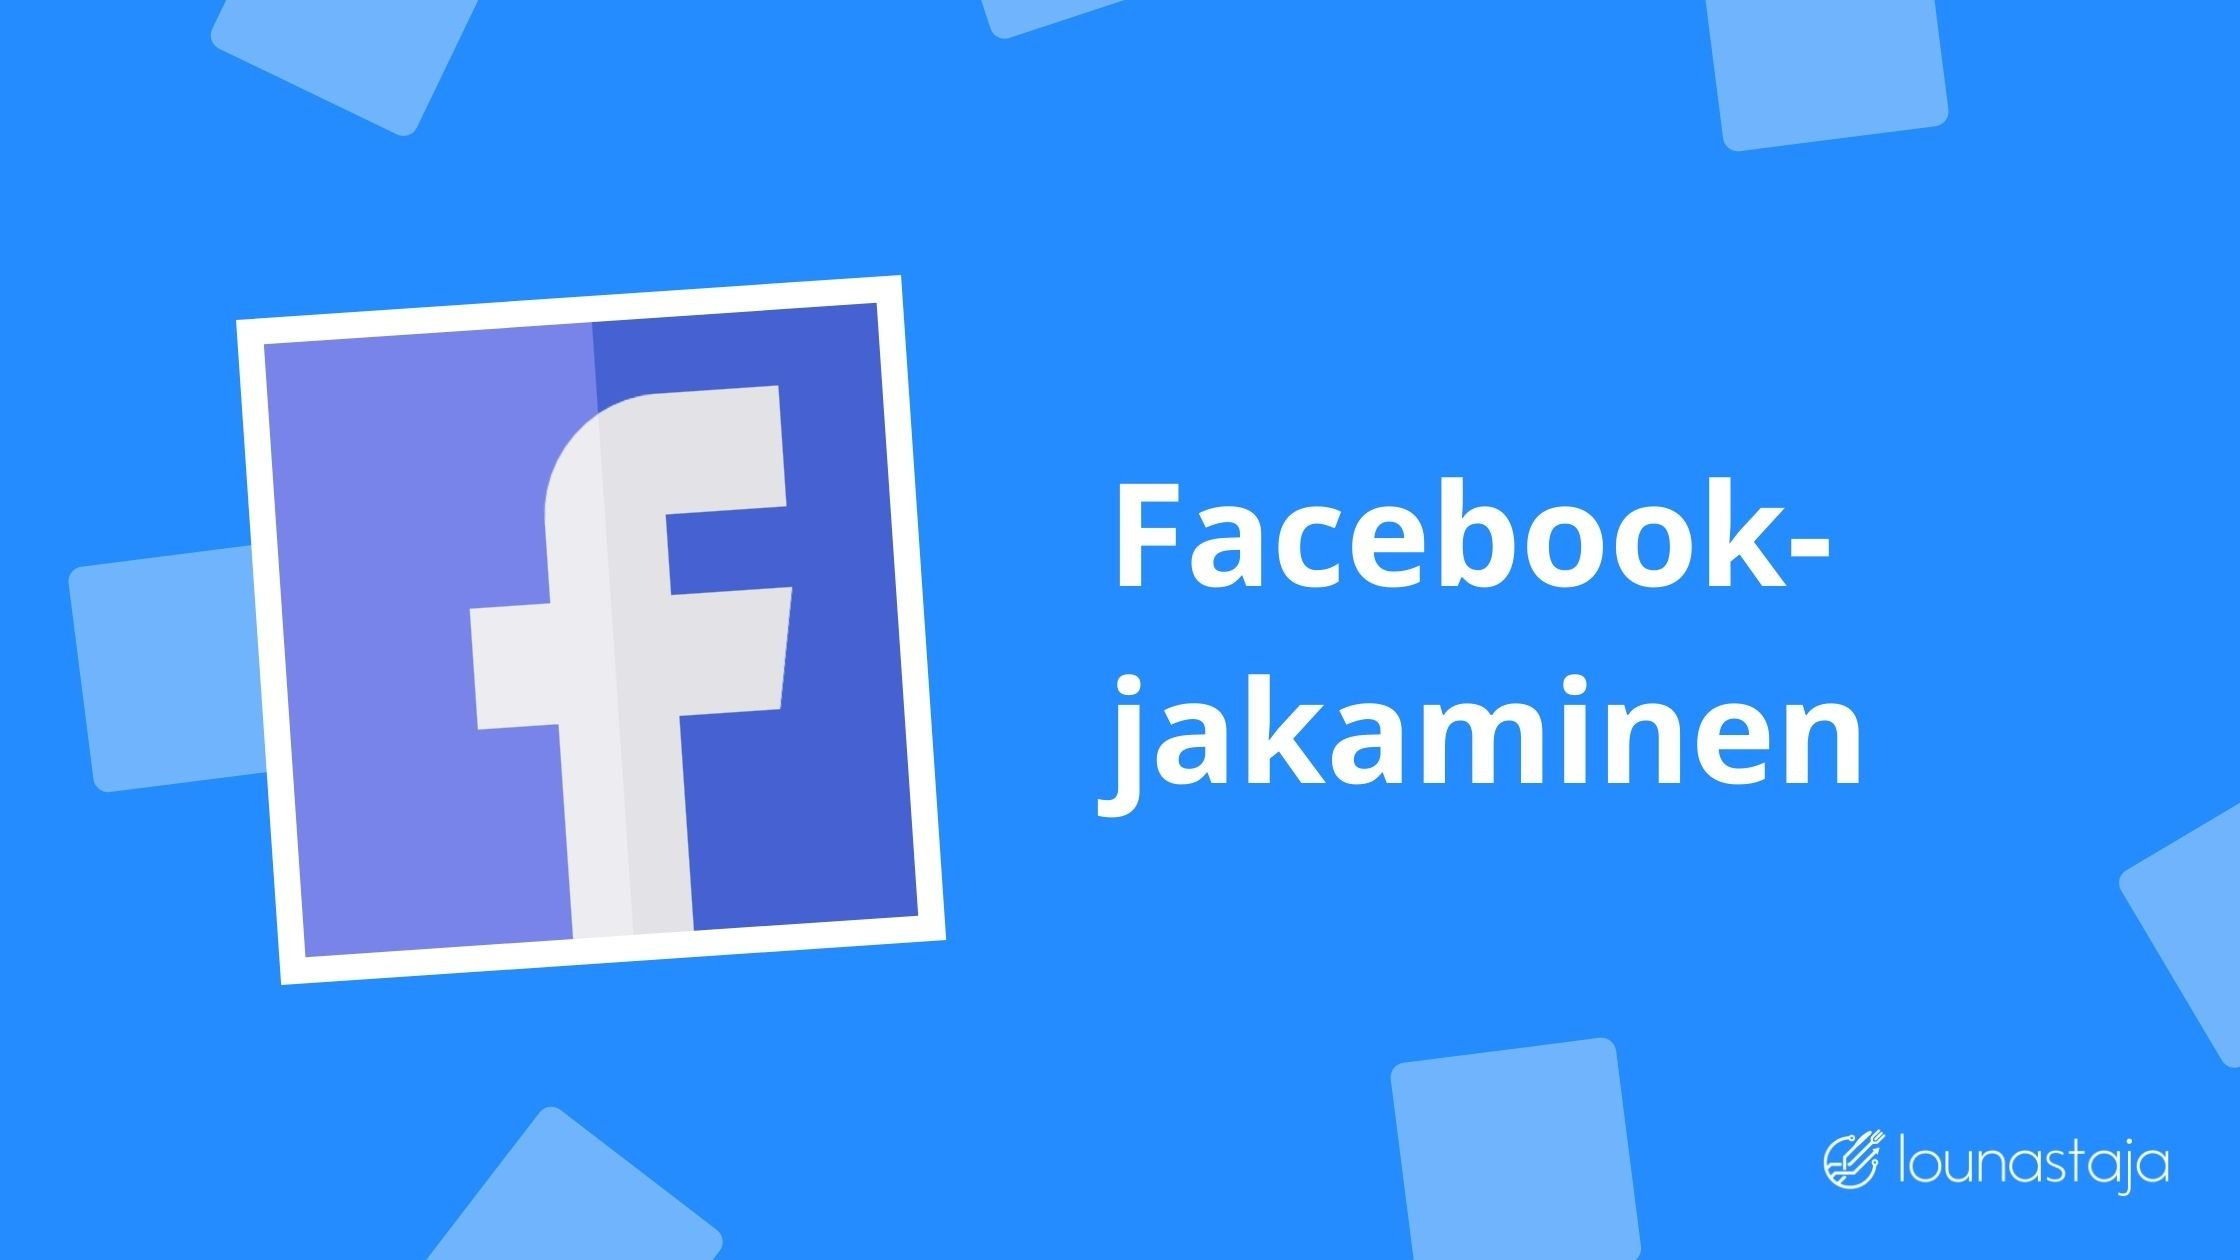 Facebook-jakaminen